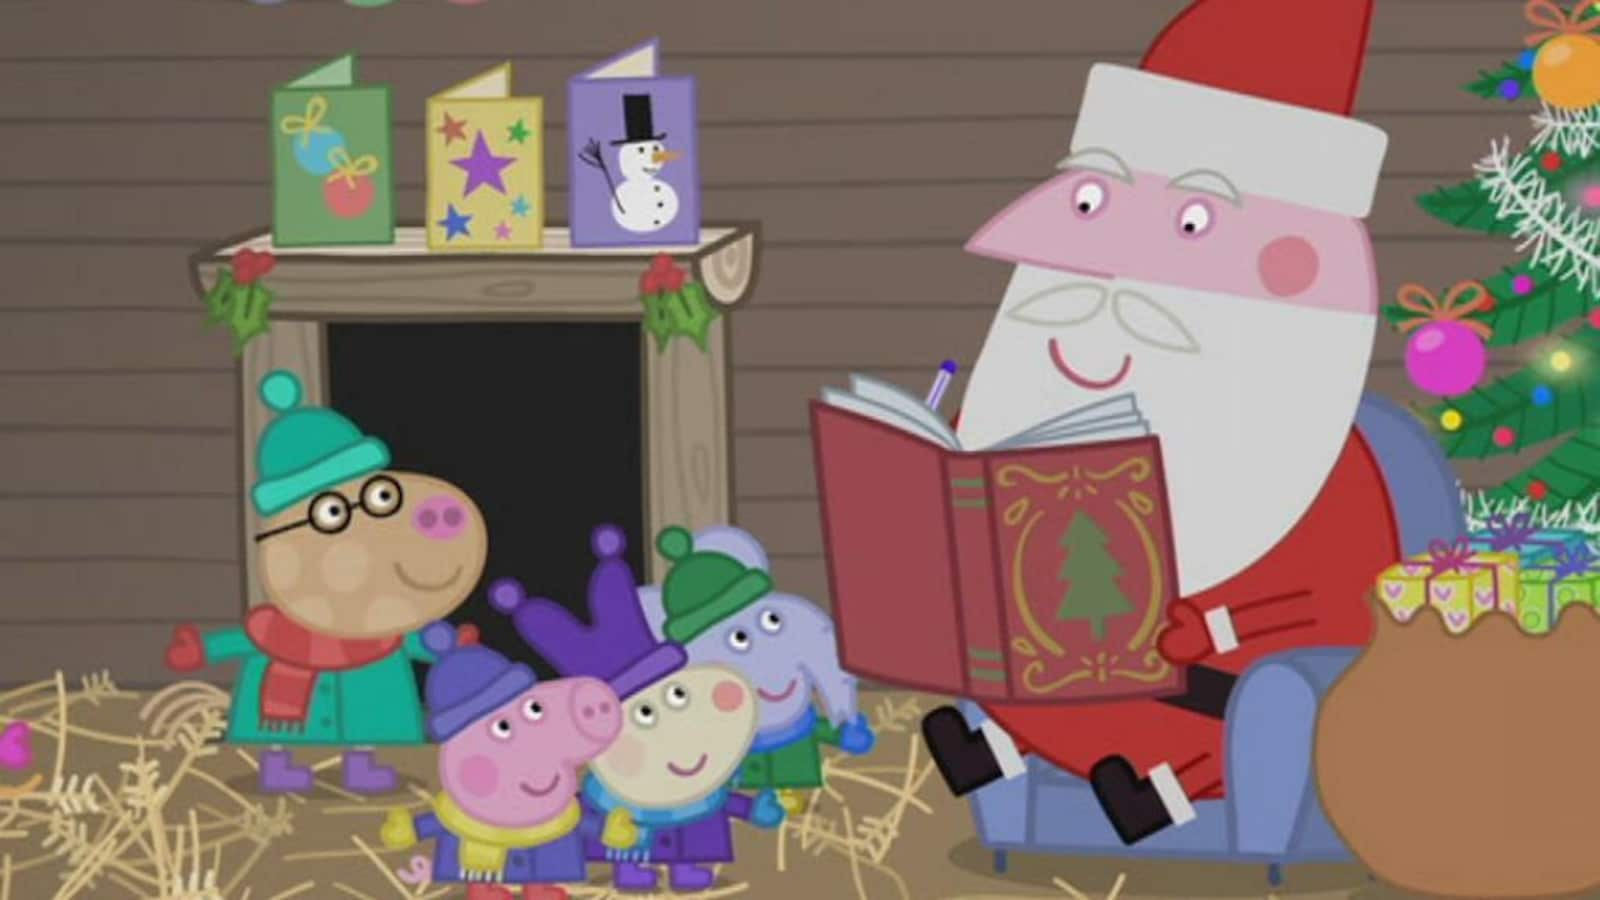 12. Joulupukin paja